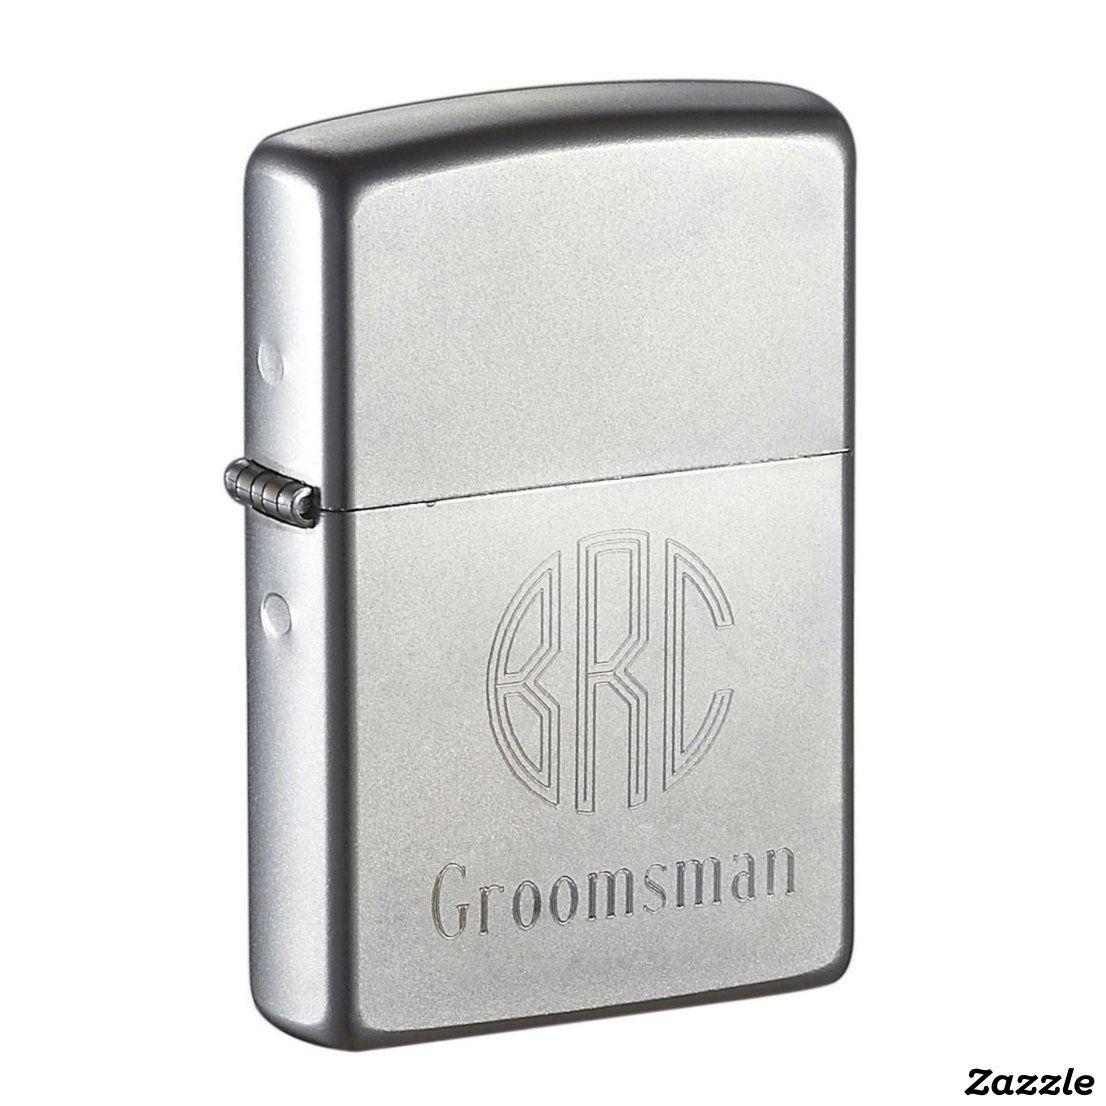 Custom Engraved Groomsman Zippo Lighter  | Zazzle.com #zippo